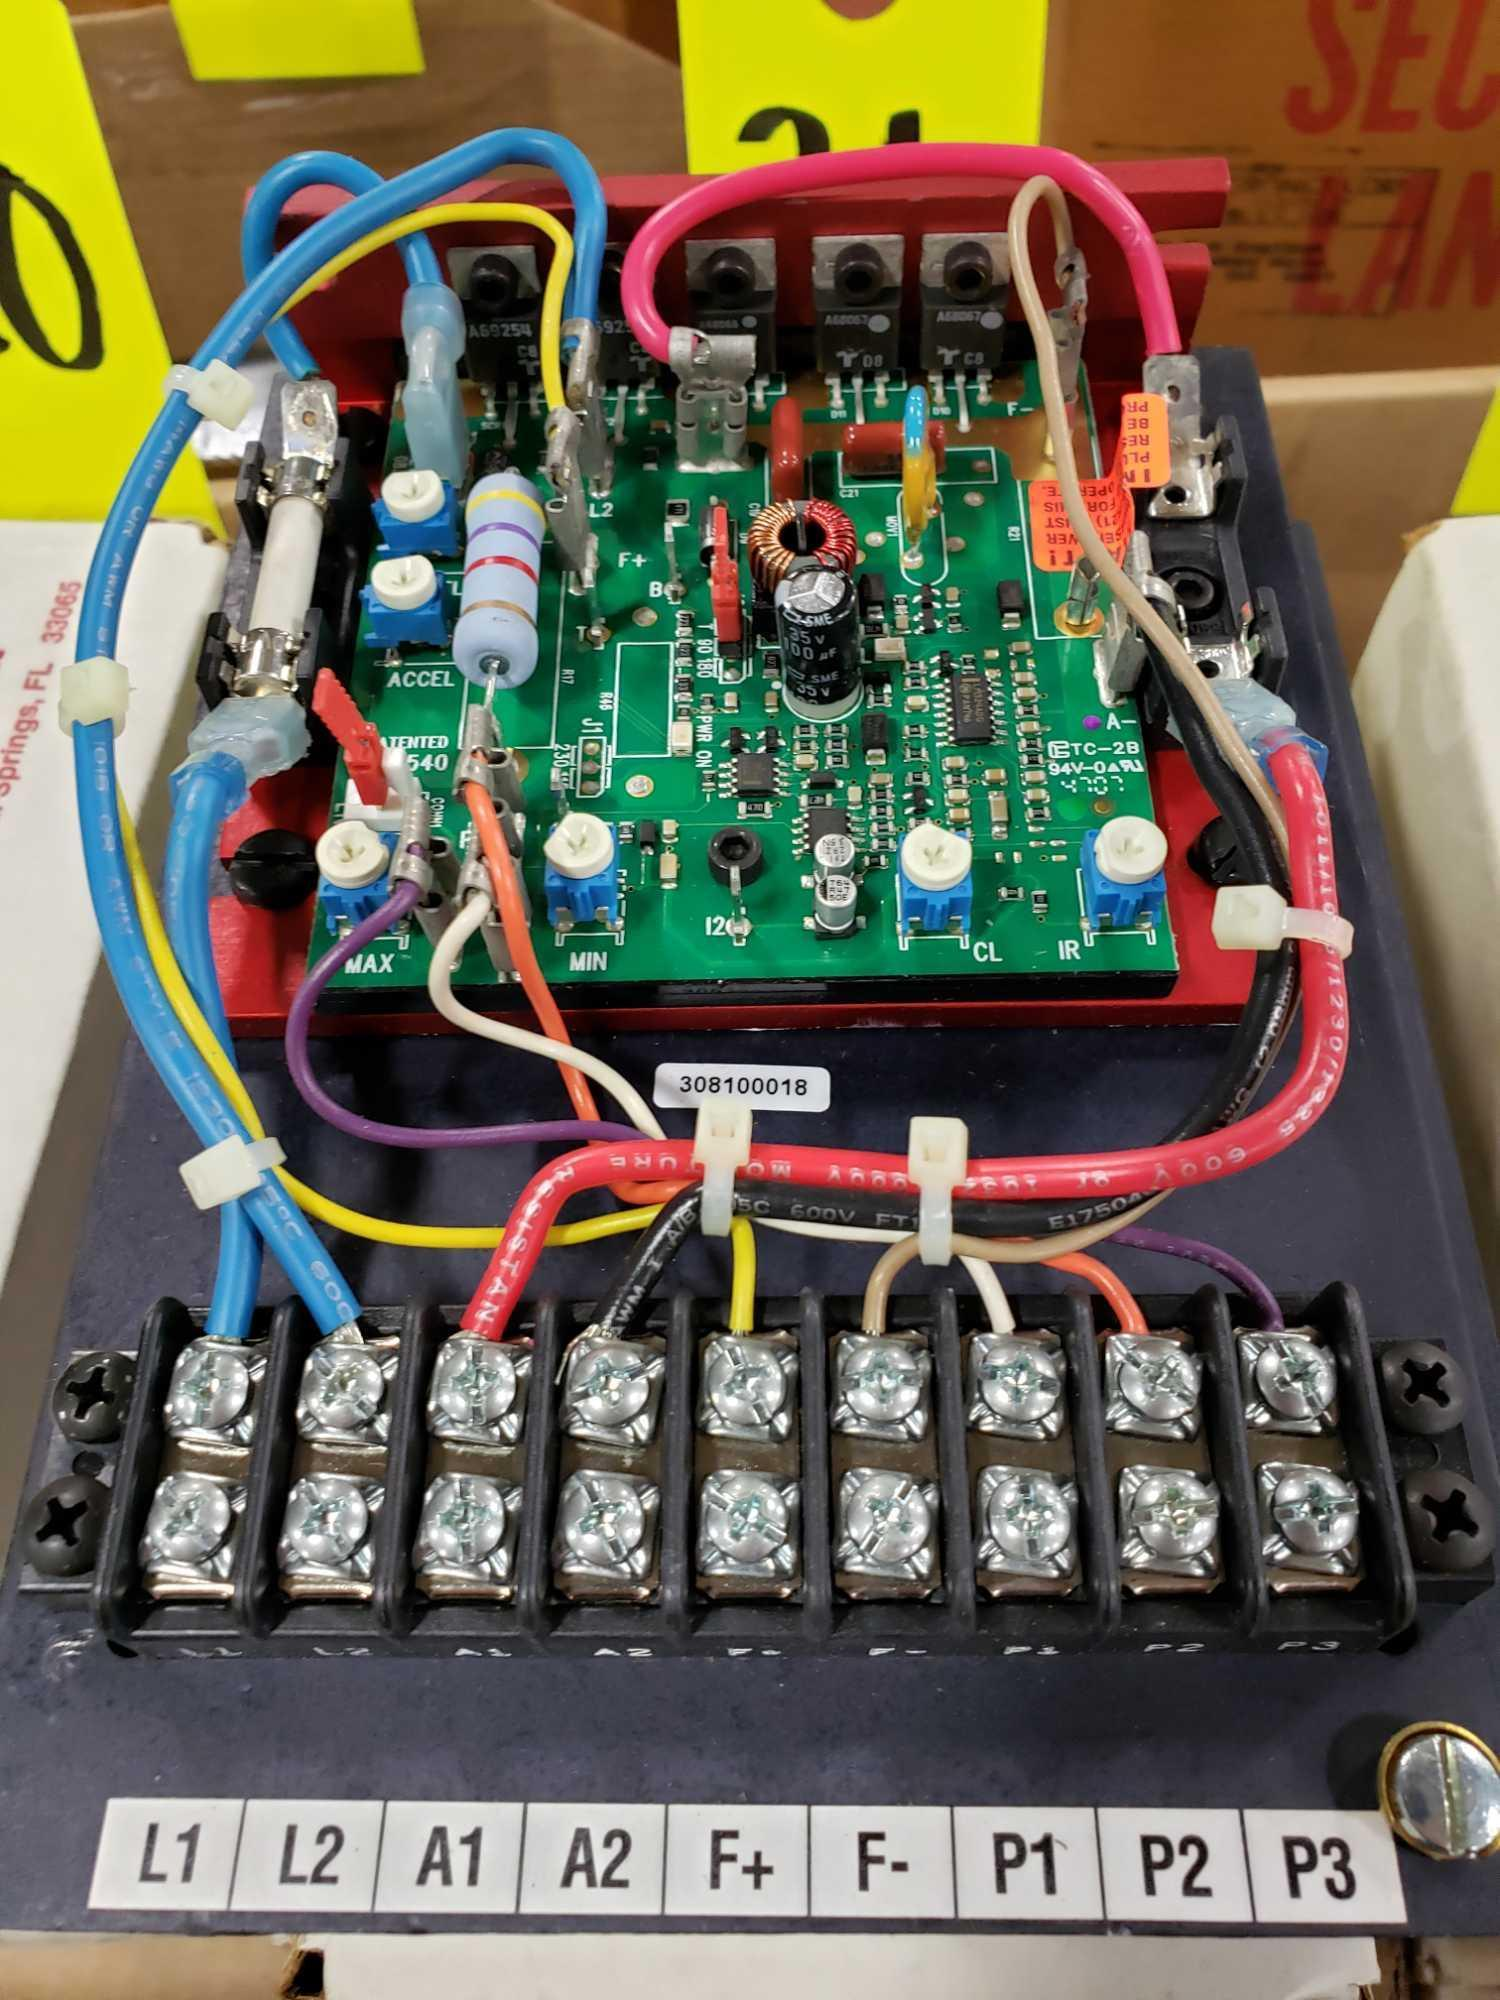 KB Penta Power reversing controld drive. Model KBCC-125, part 9936ED. New in box. - Image 4 of 4